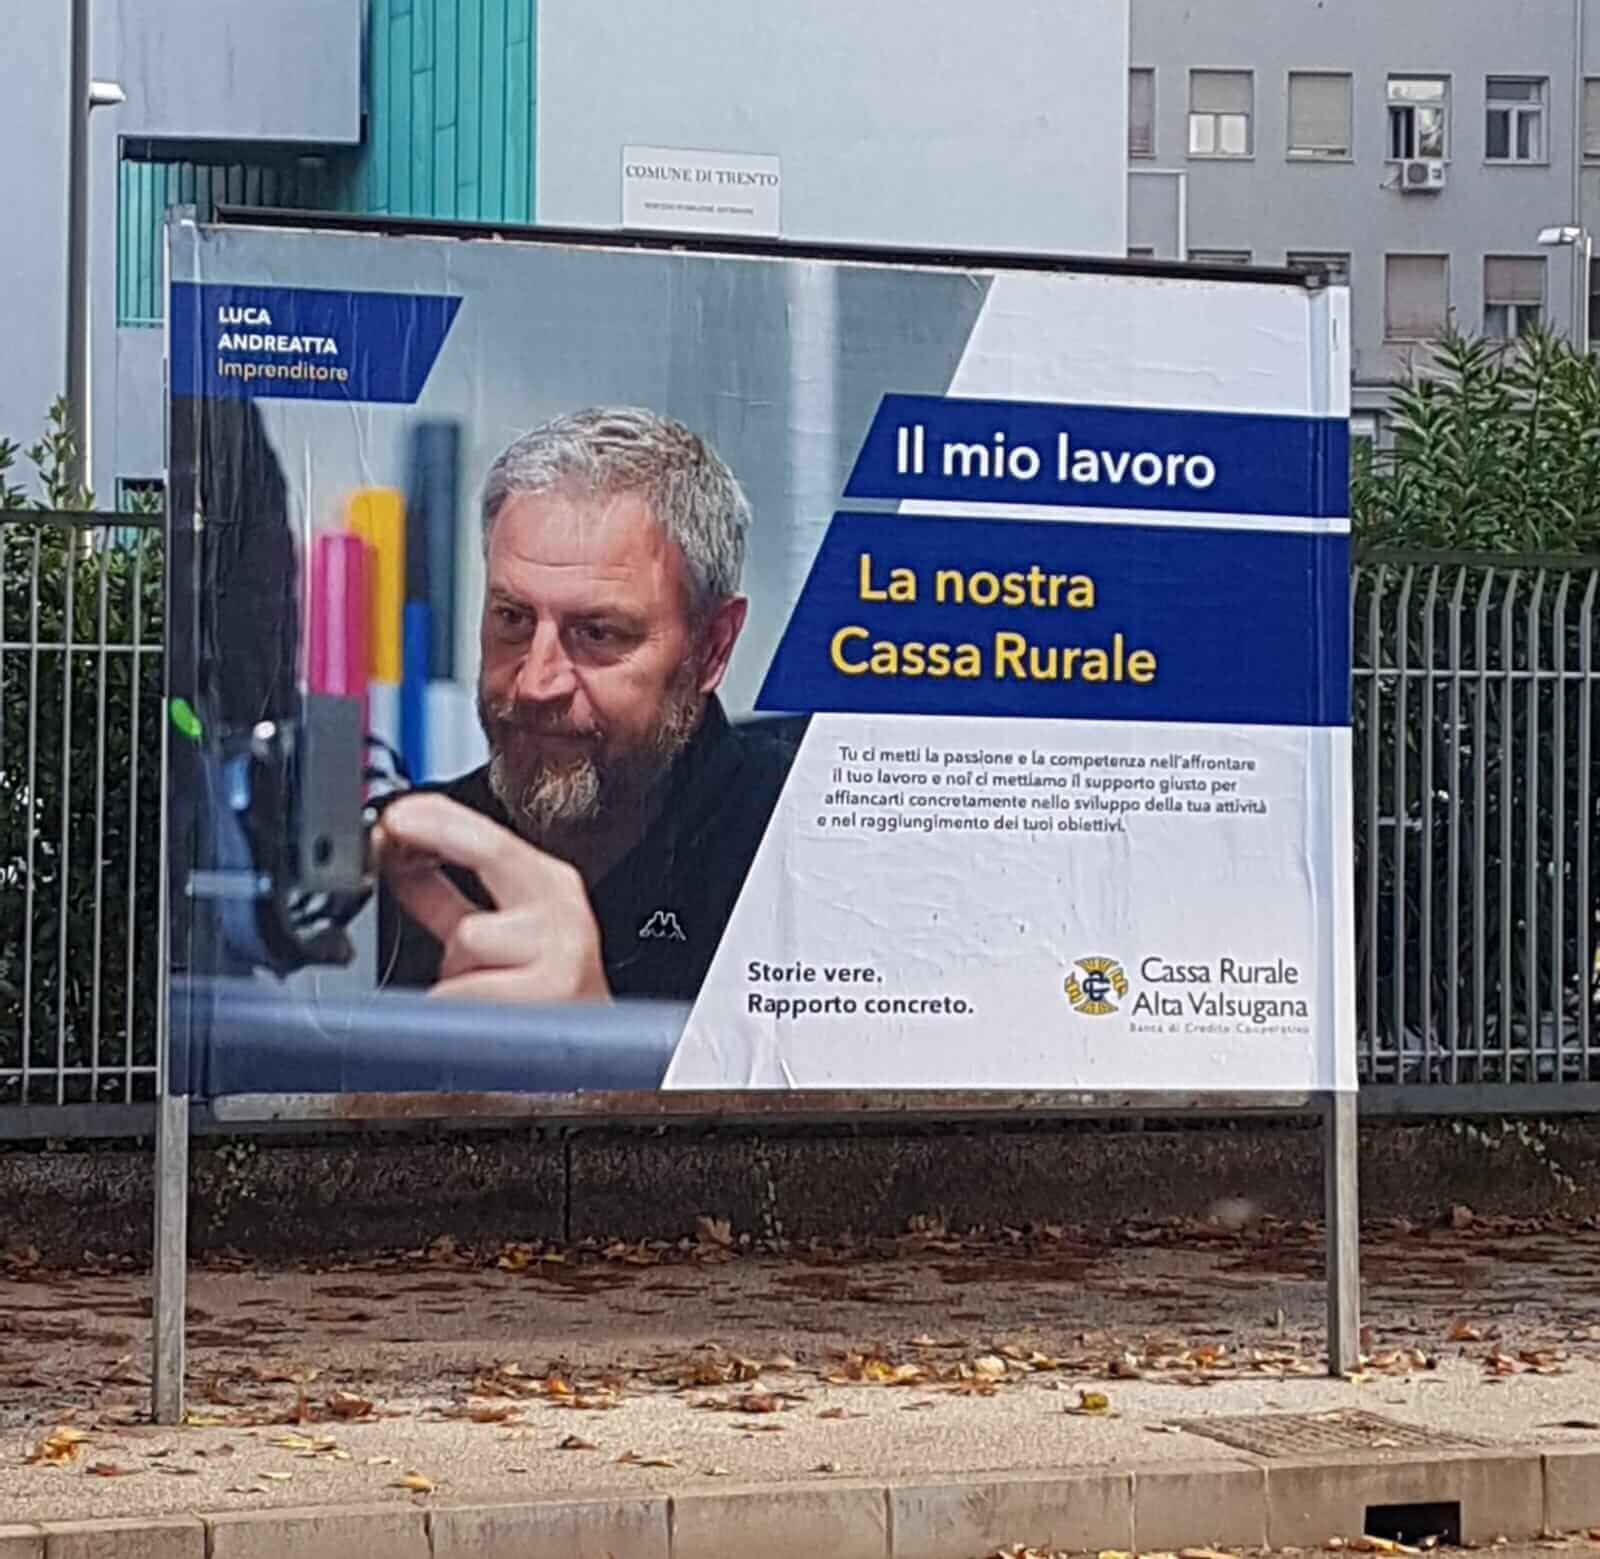 La Nostra Cassa Rurale_18